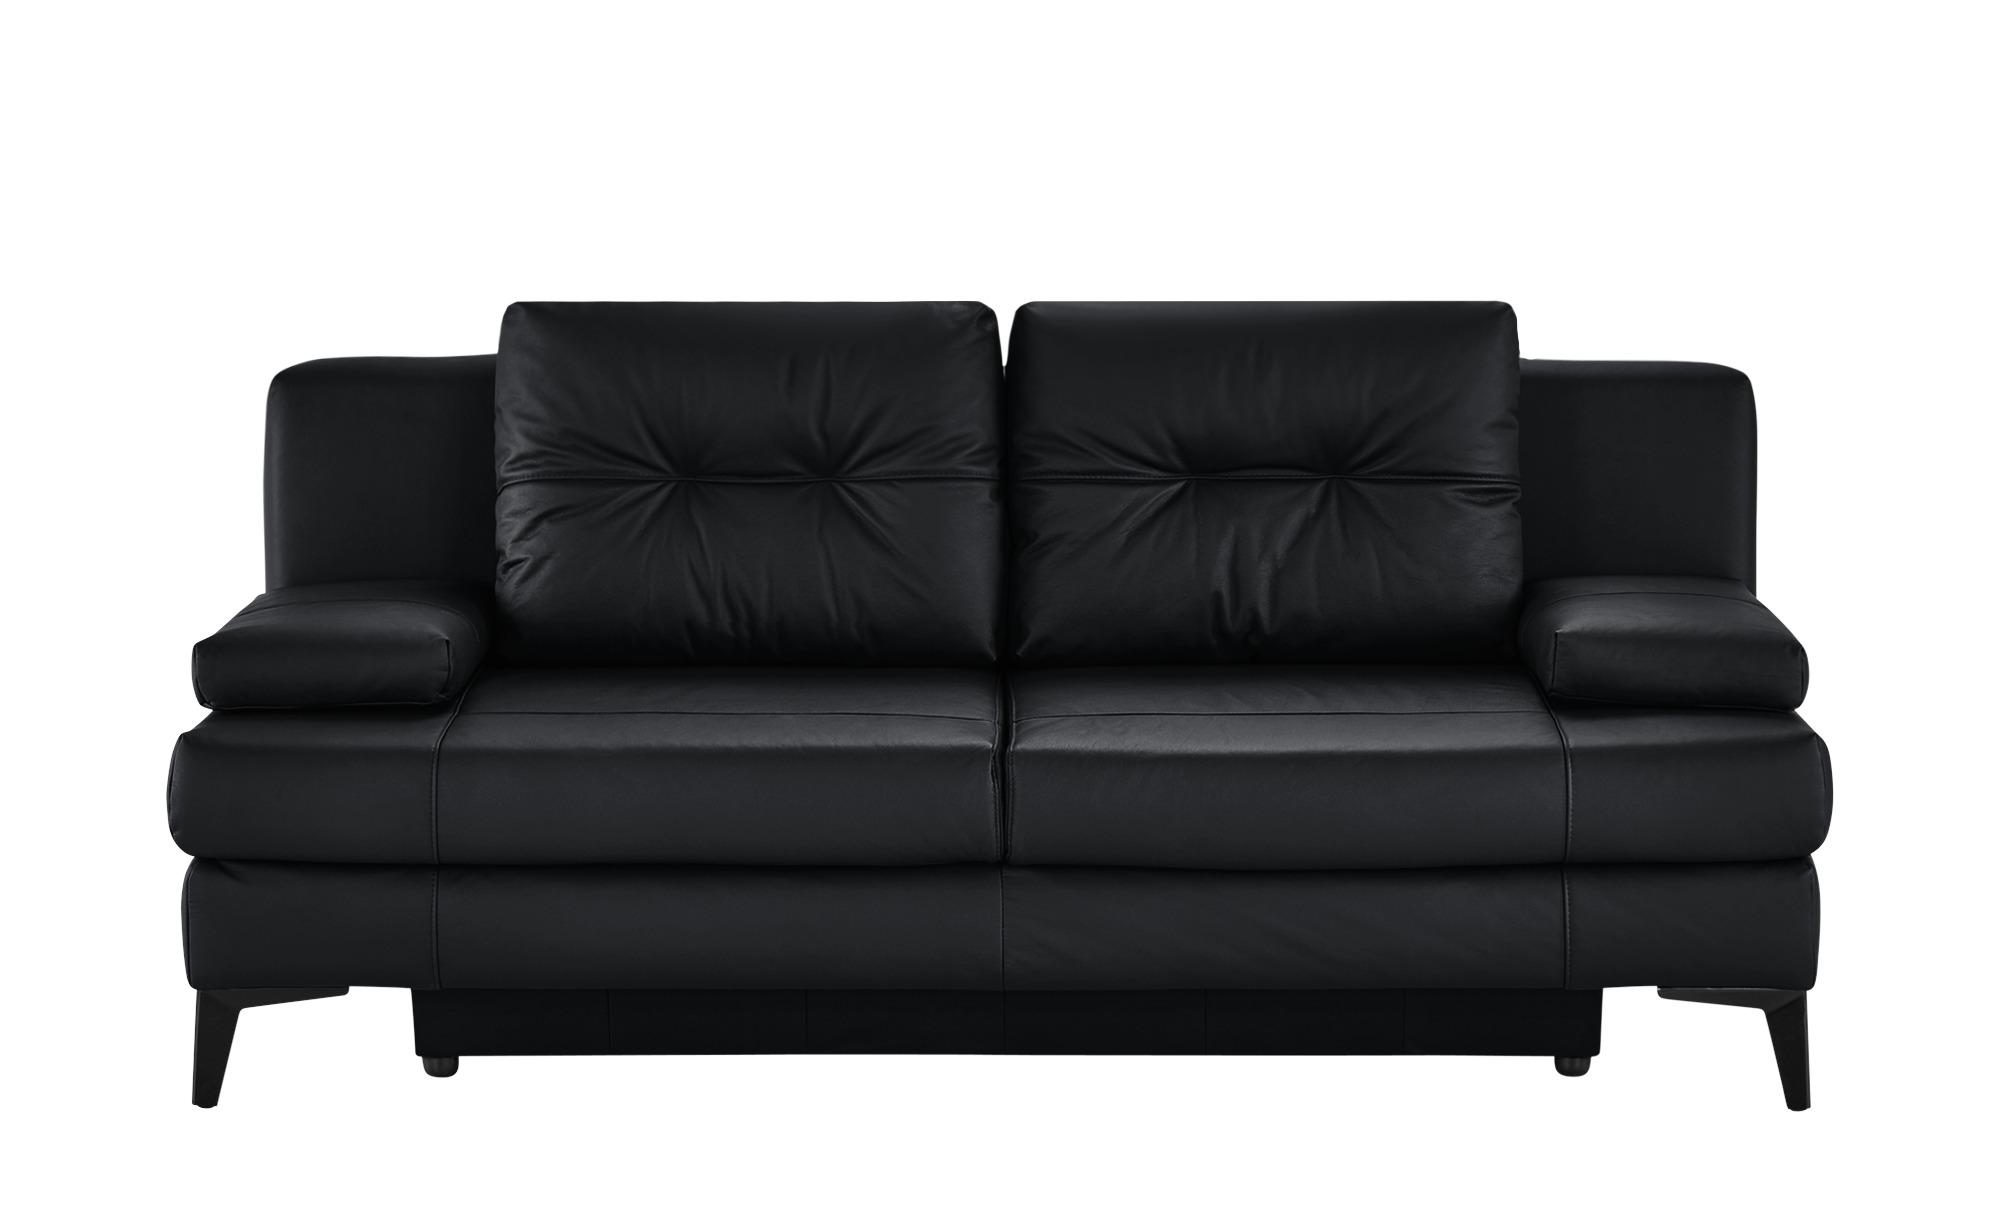 Ledersofa  Svea ¦ schwarz ¦ Maße (cm): B: 202 H: 92 T: 100 Polstermöbel > Sofas > 2-Sitzer - Höffner